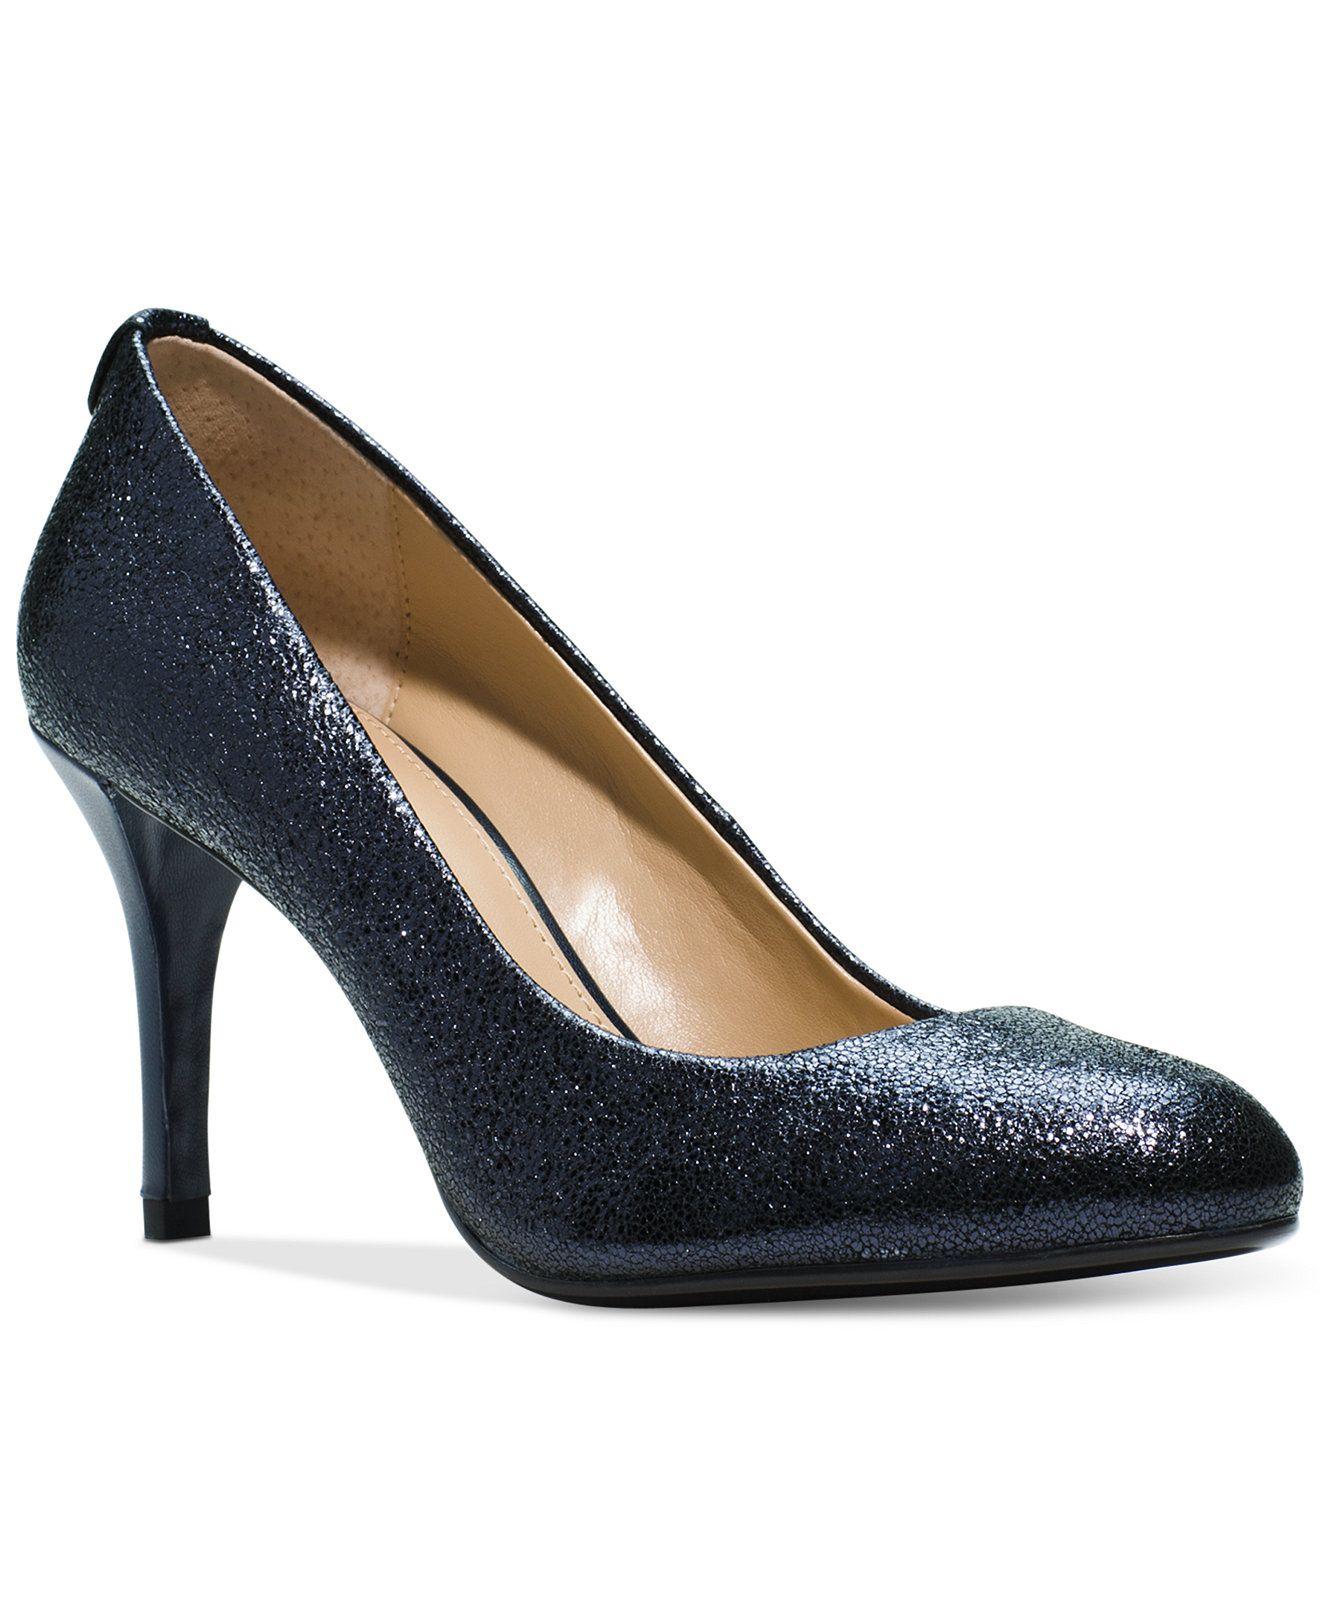 MICHAEL Michael Kors MK Flex Mid Almond-Toe Pumps - Pumps - Shoes - Macy's